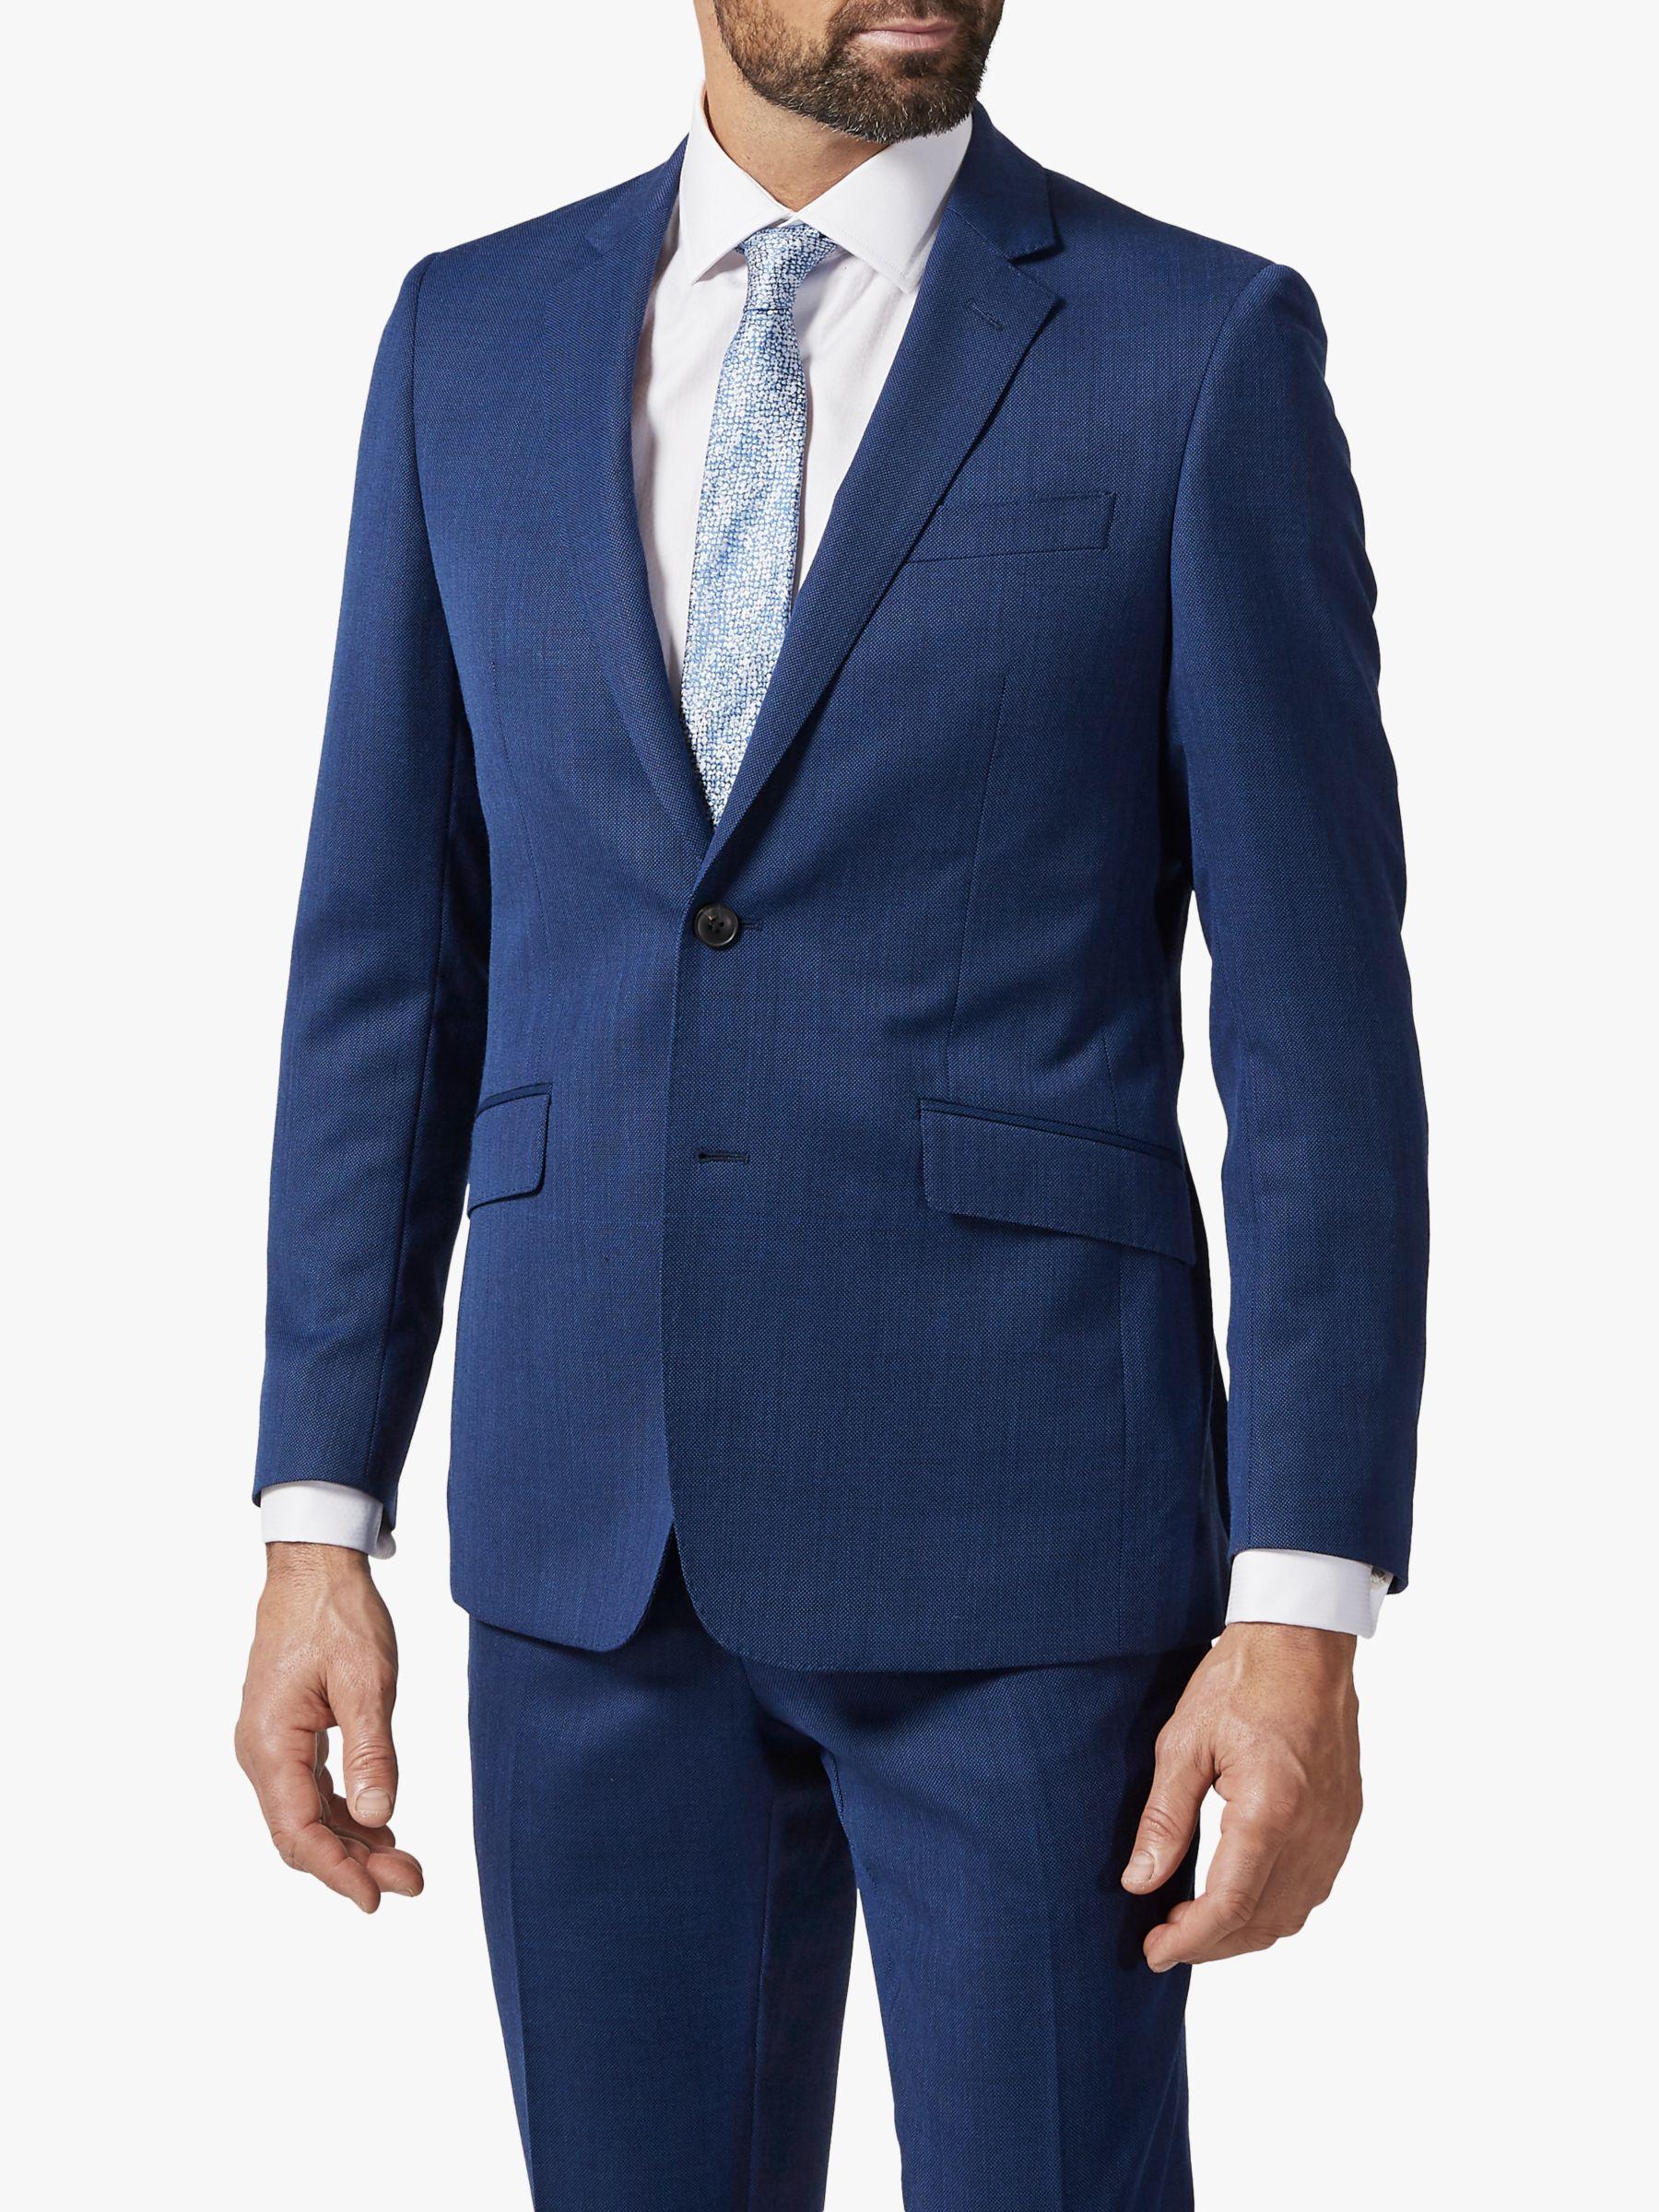 Richard James Mayfair Richard James Mayfair Geo Wool Tailored Suit Jacket, Dark Blue